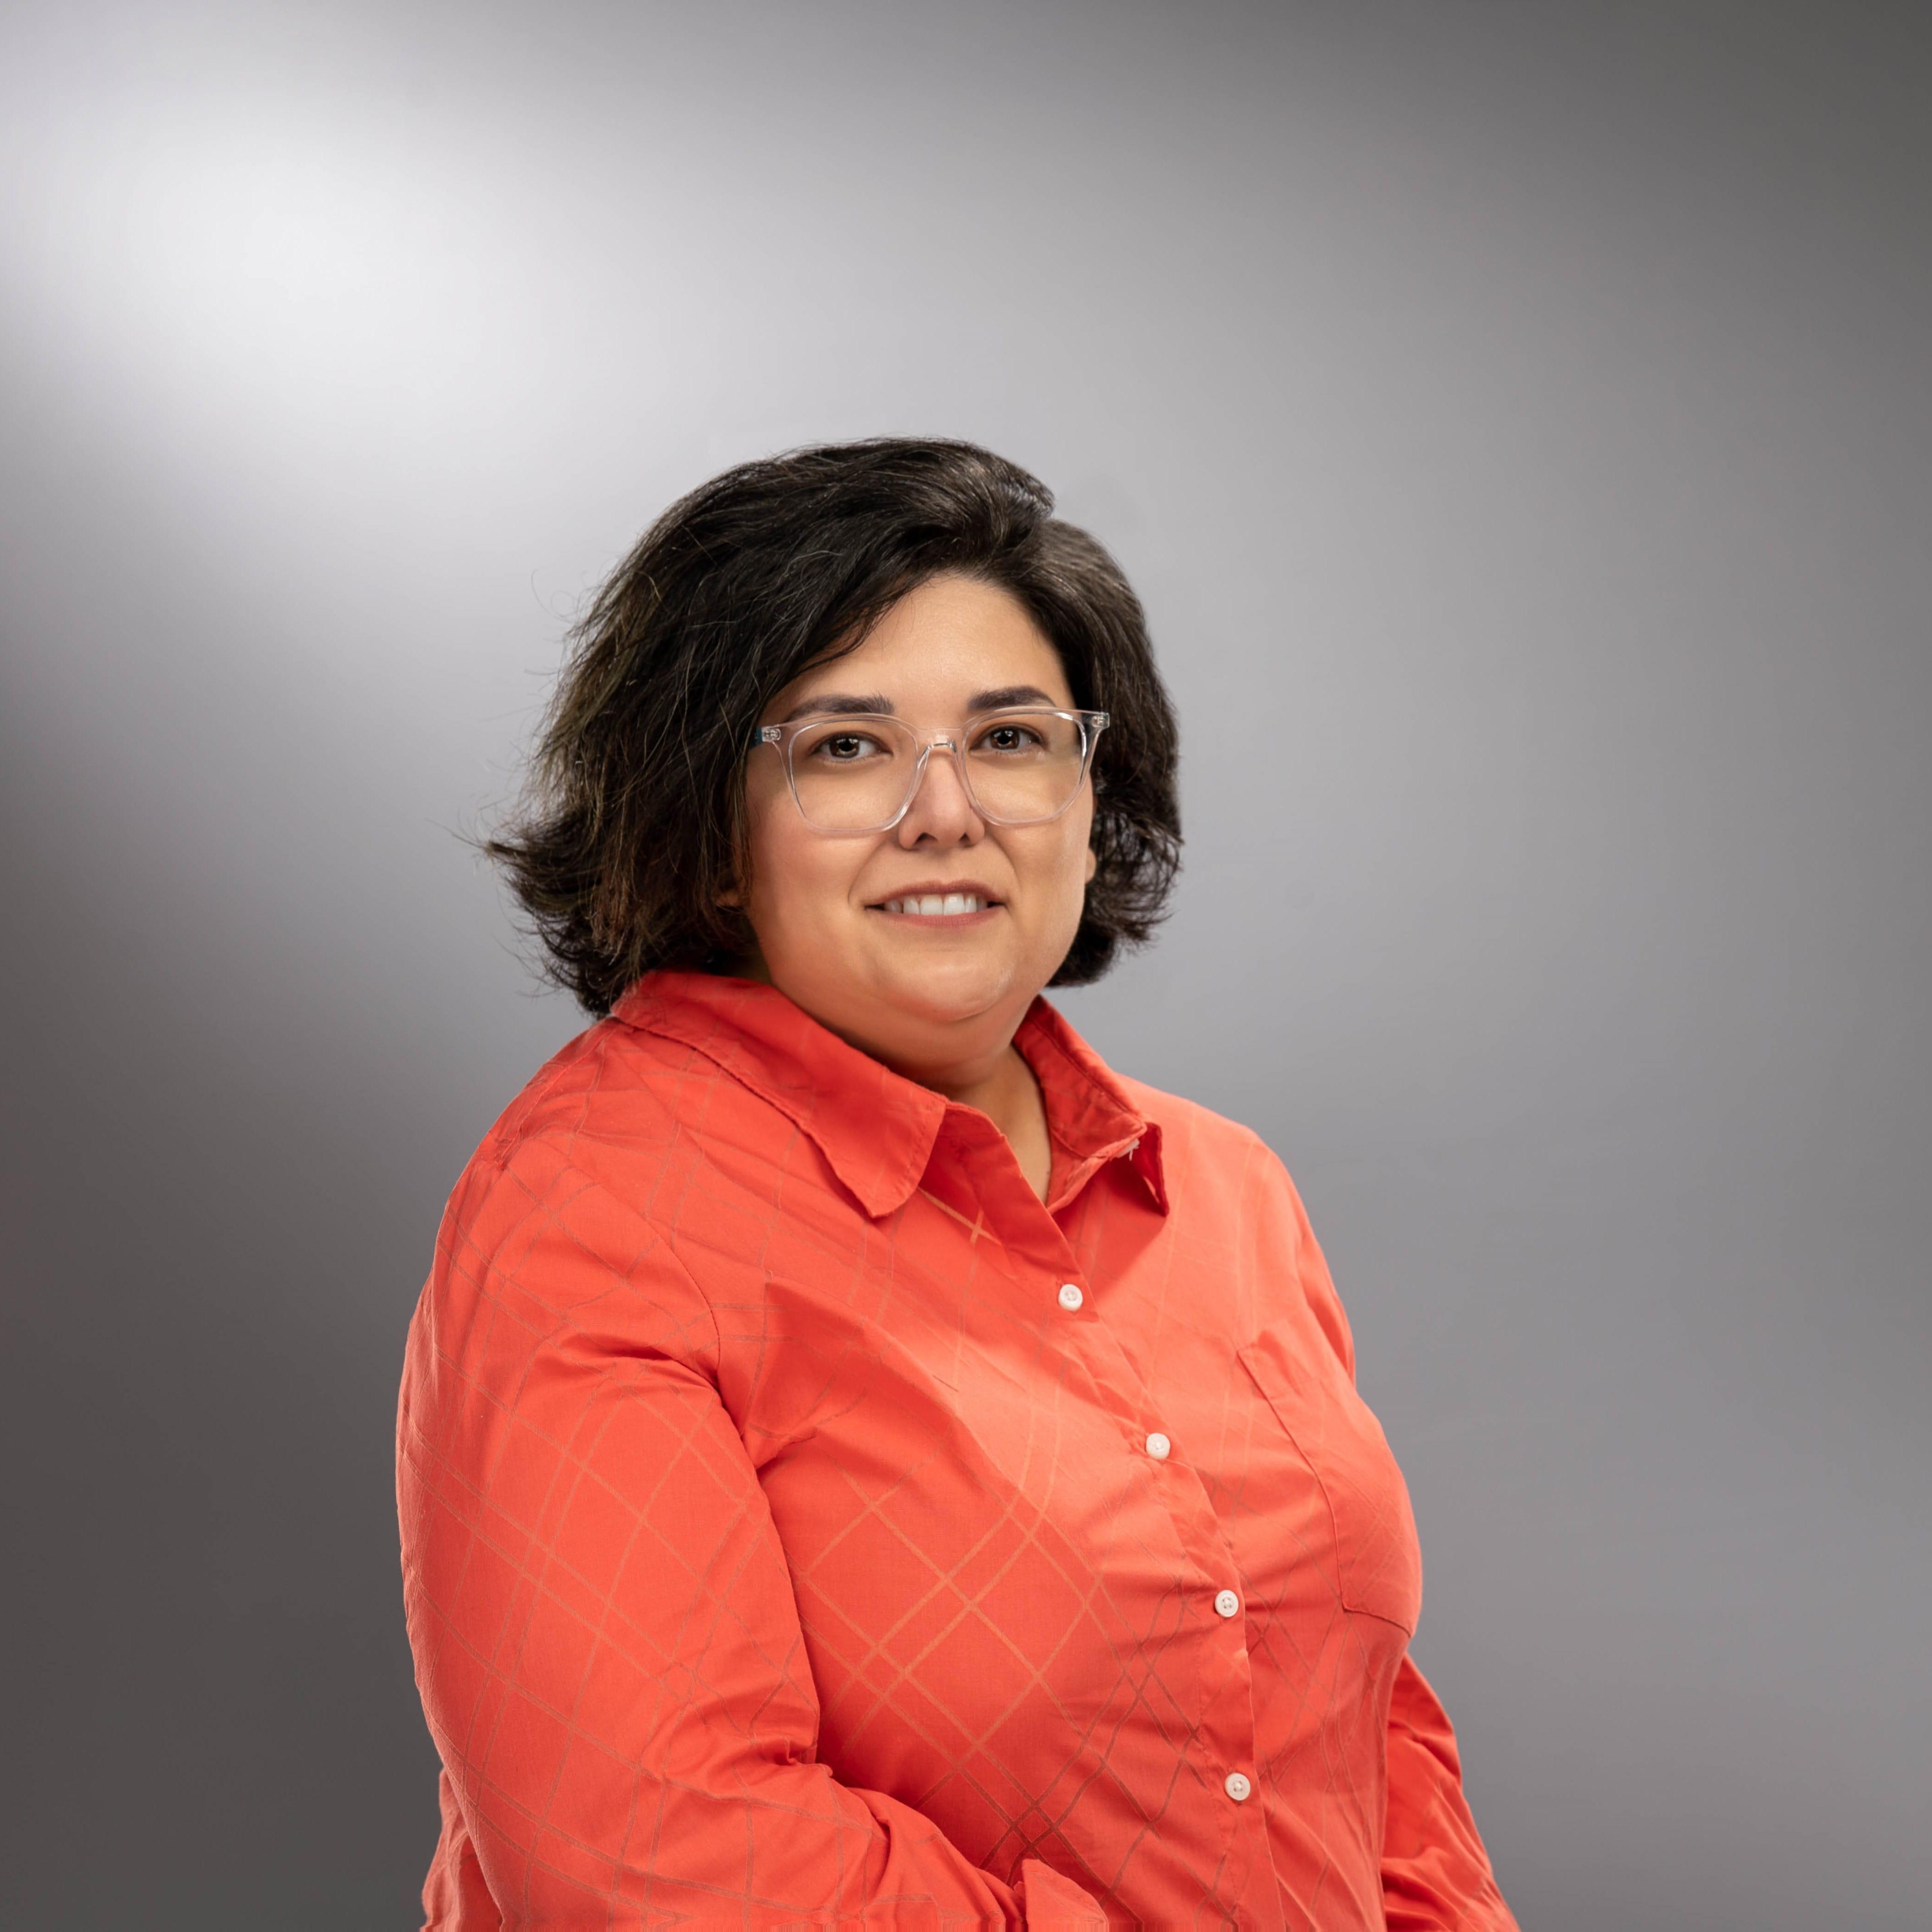 Headshot of Monica Franco